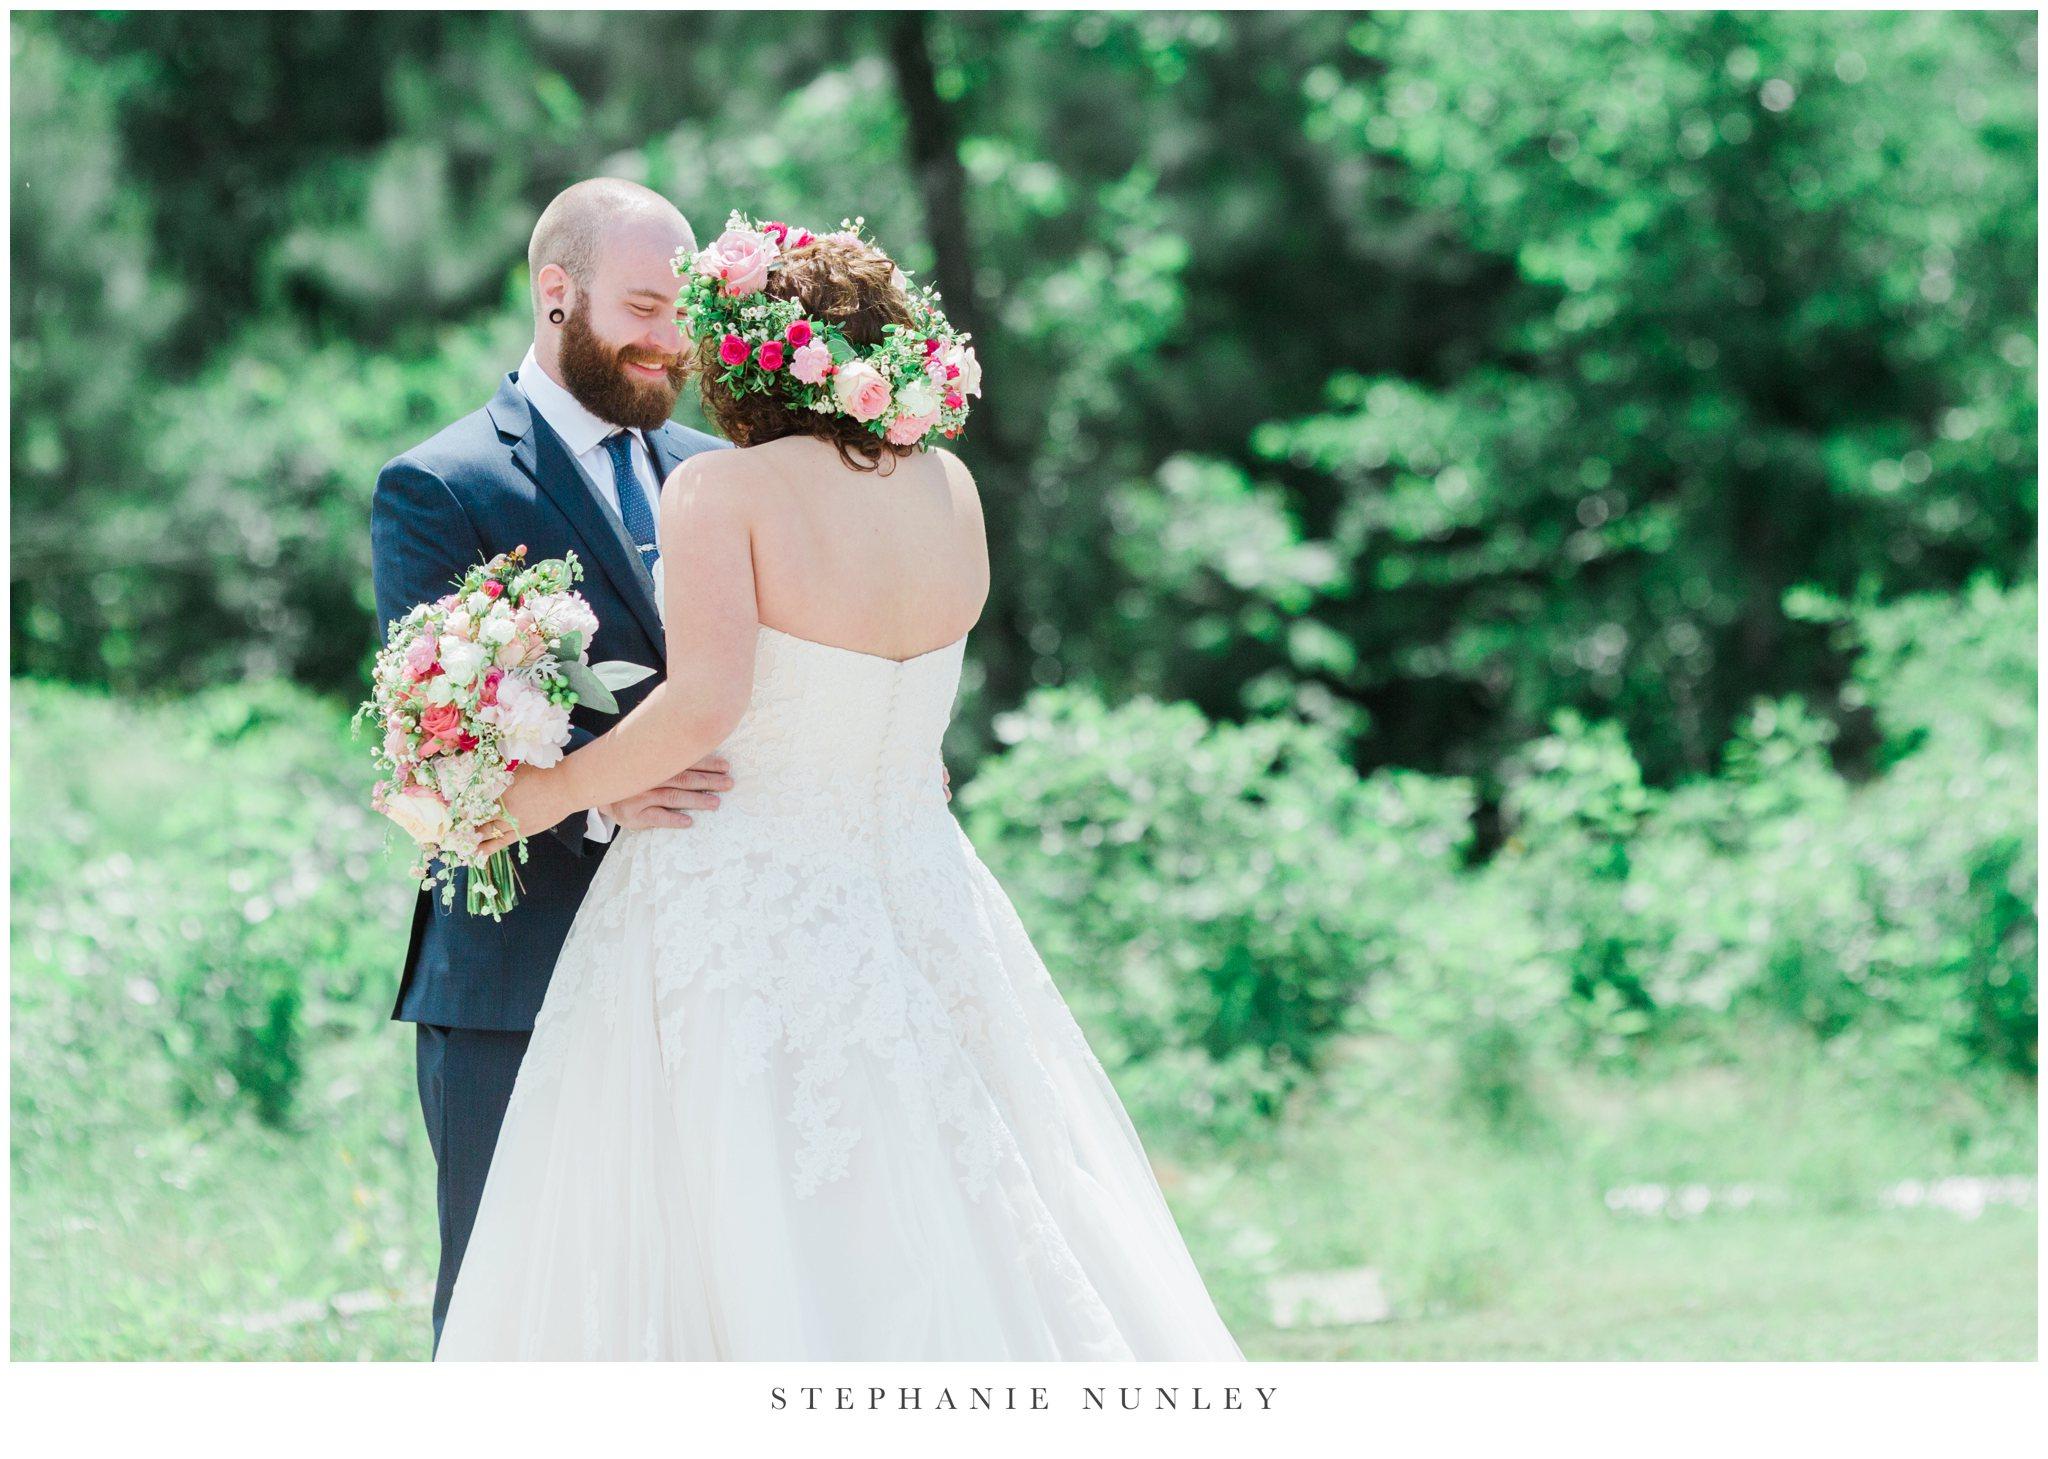 romantic-outdoor-wedding-with-flower-crown-0028.jpg